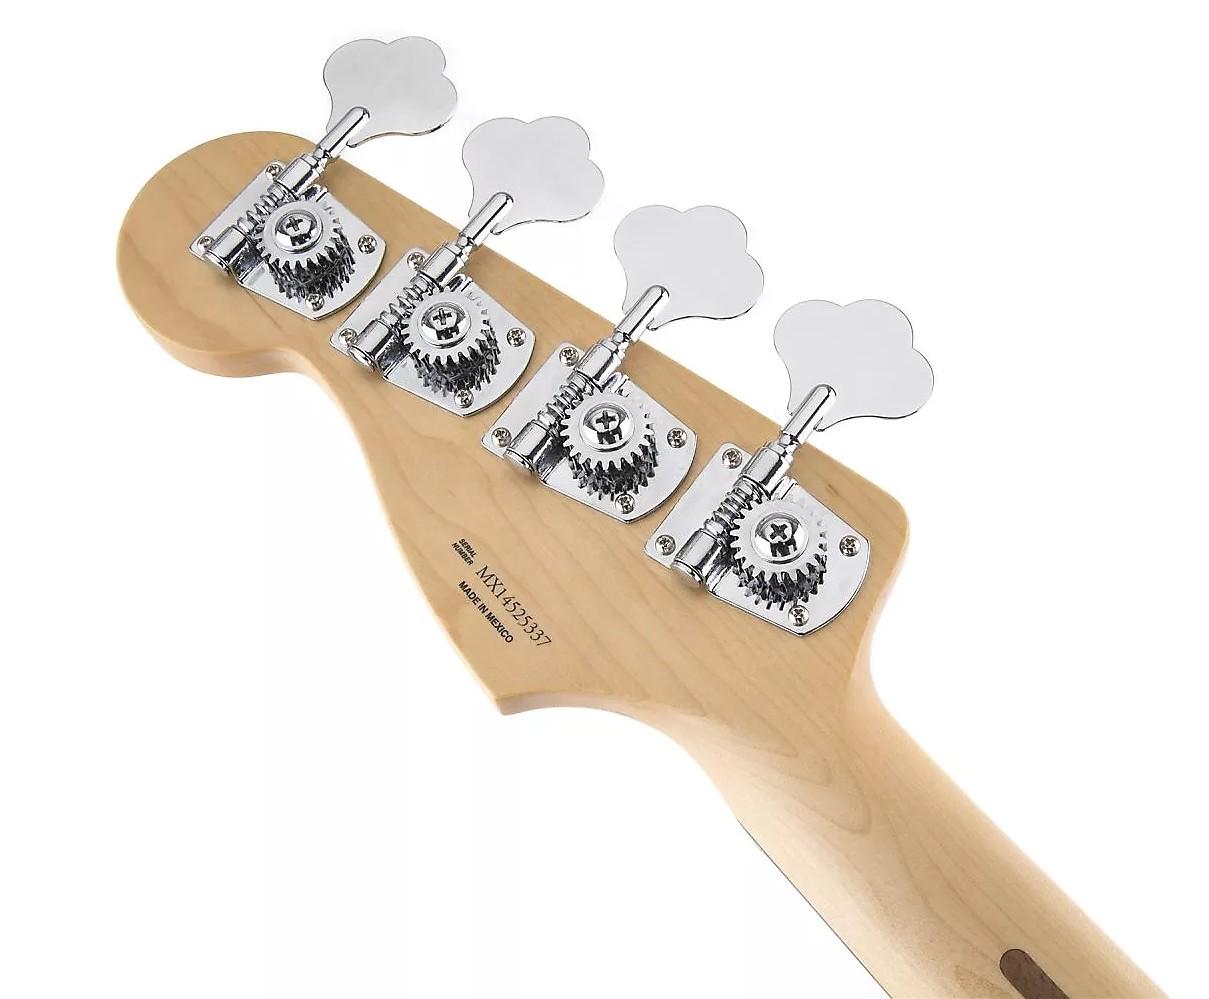 Contrabaixo Fender Standard Dimension Bass IV Black Preto  - MegaLojaSP